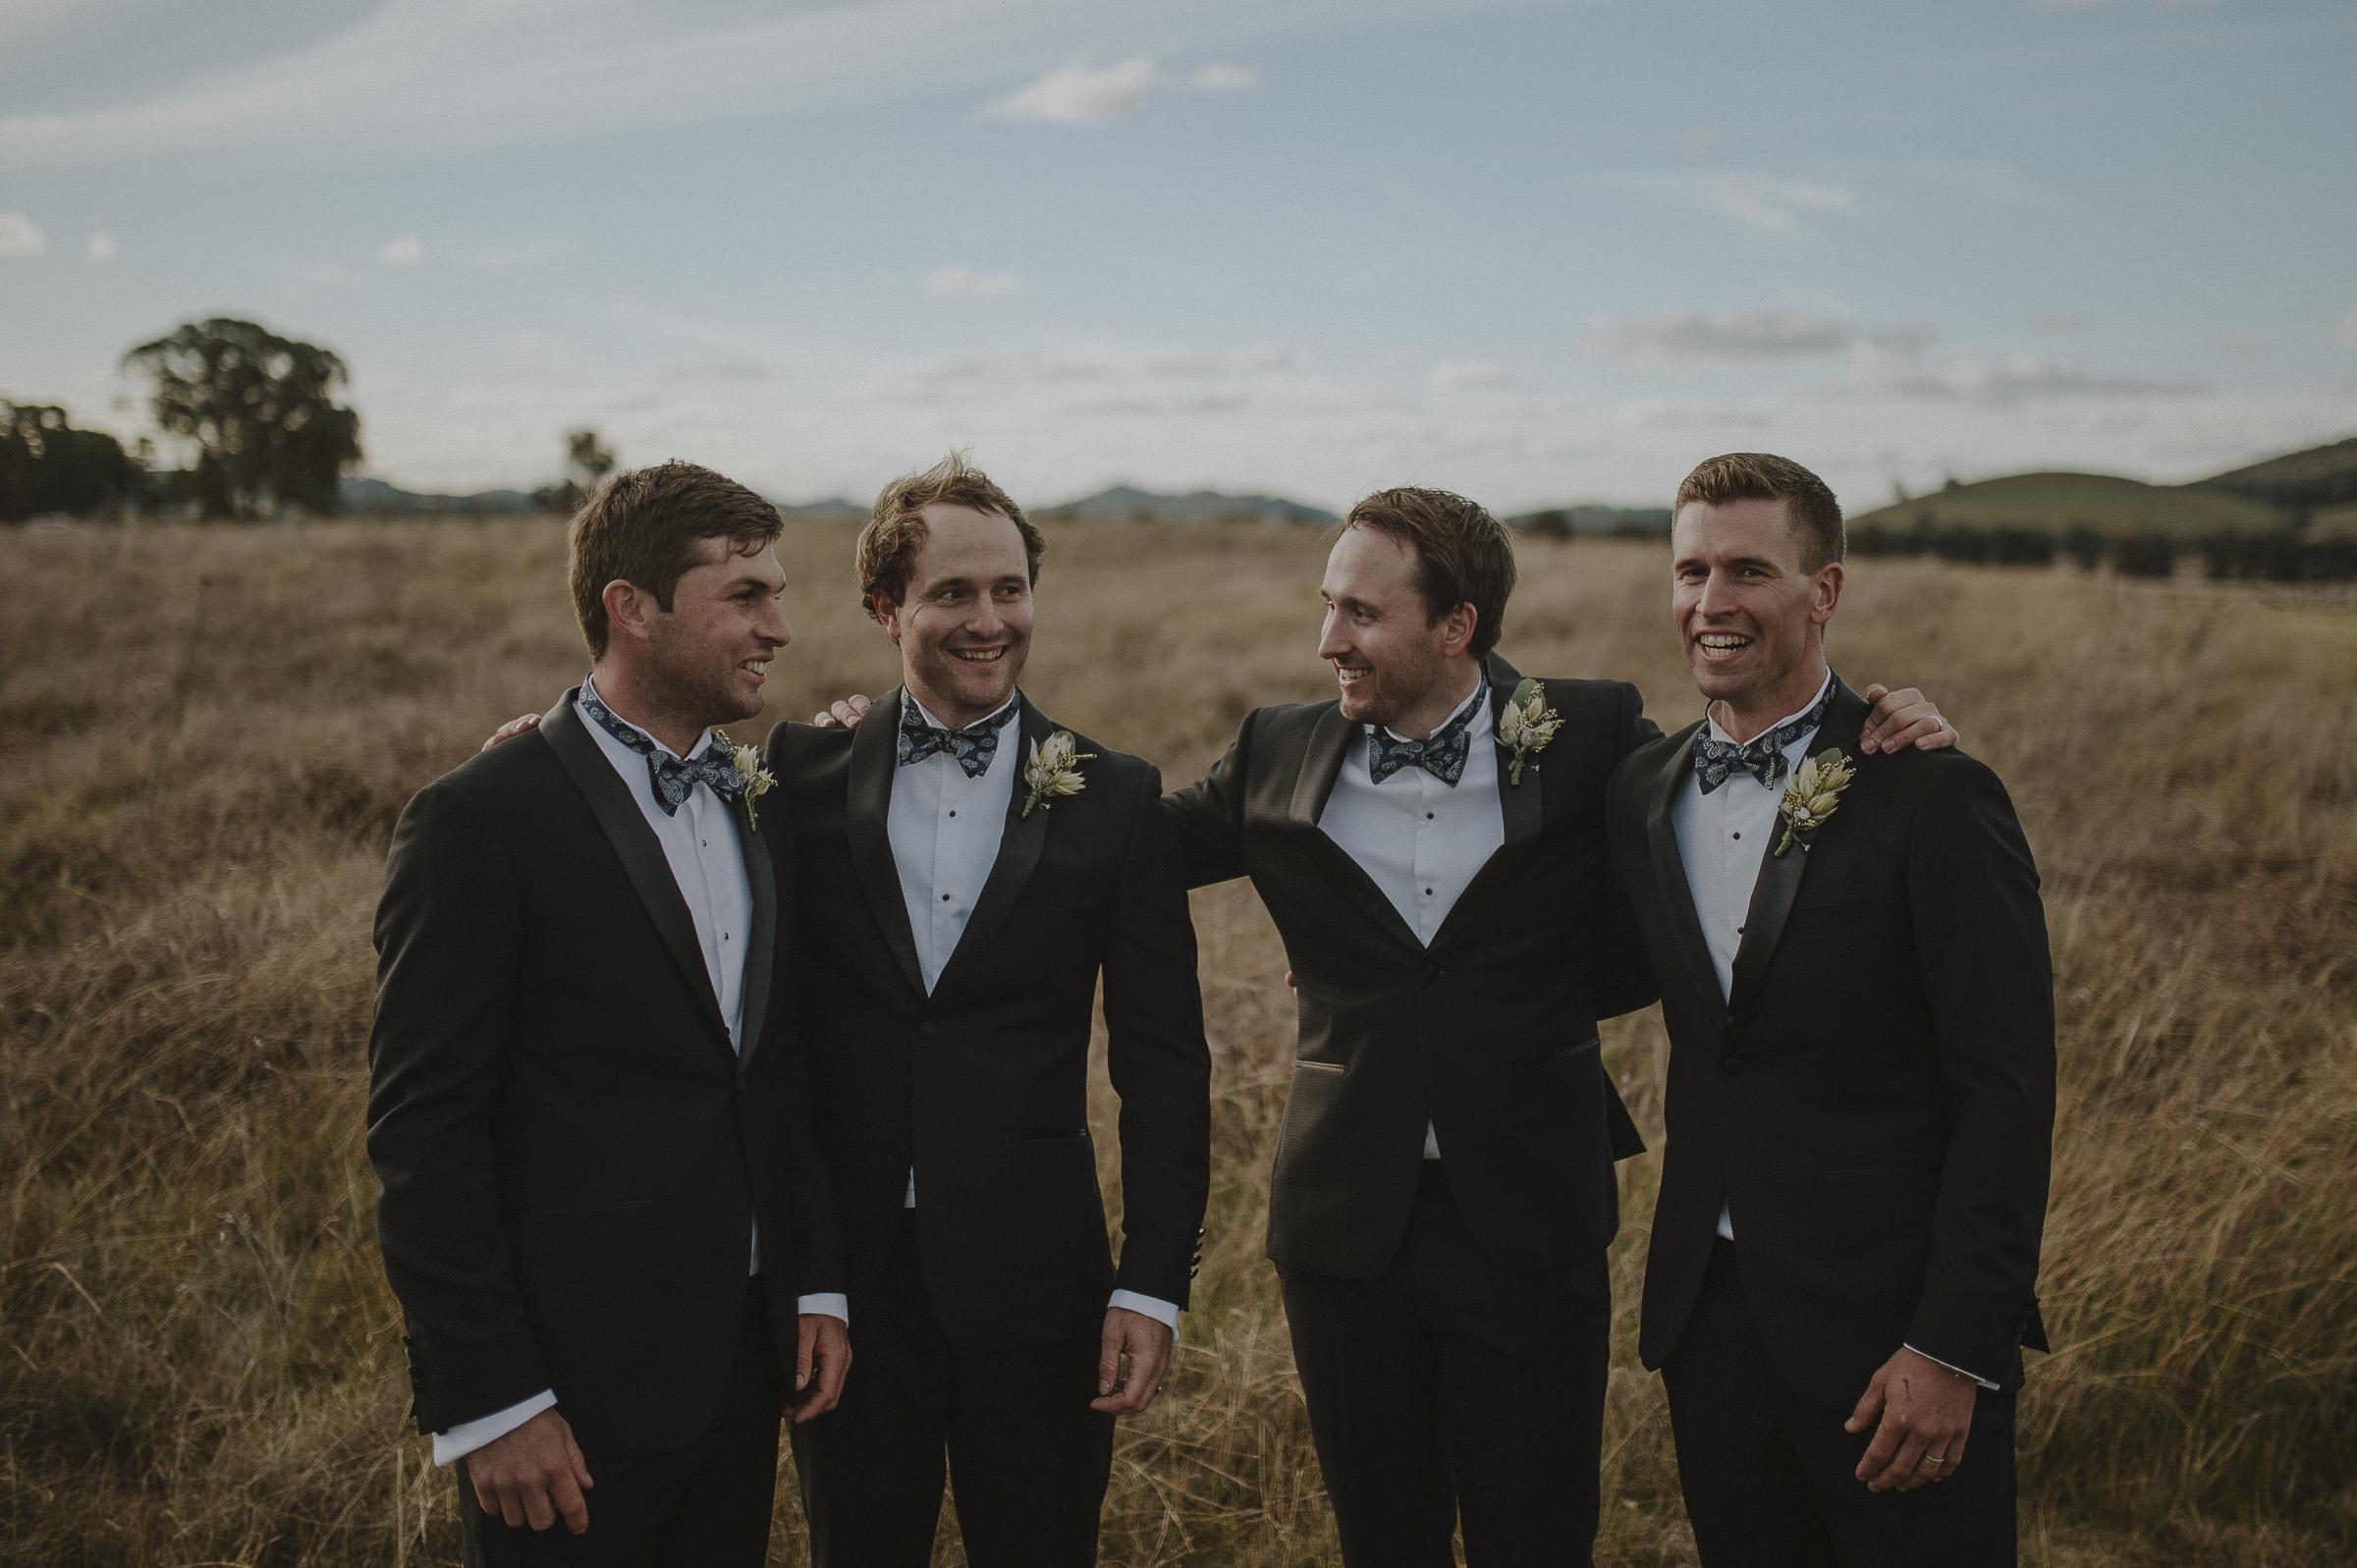 Emily_Skewesy_Mudgee_Wedding_Blog-21.jpg